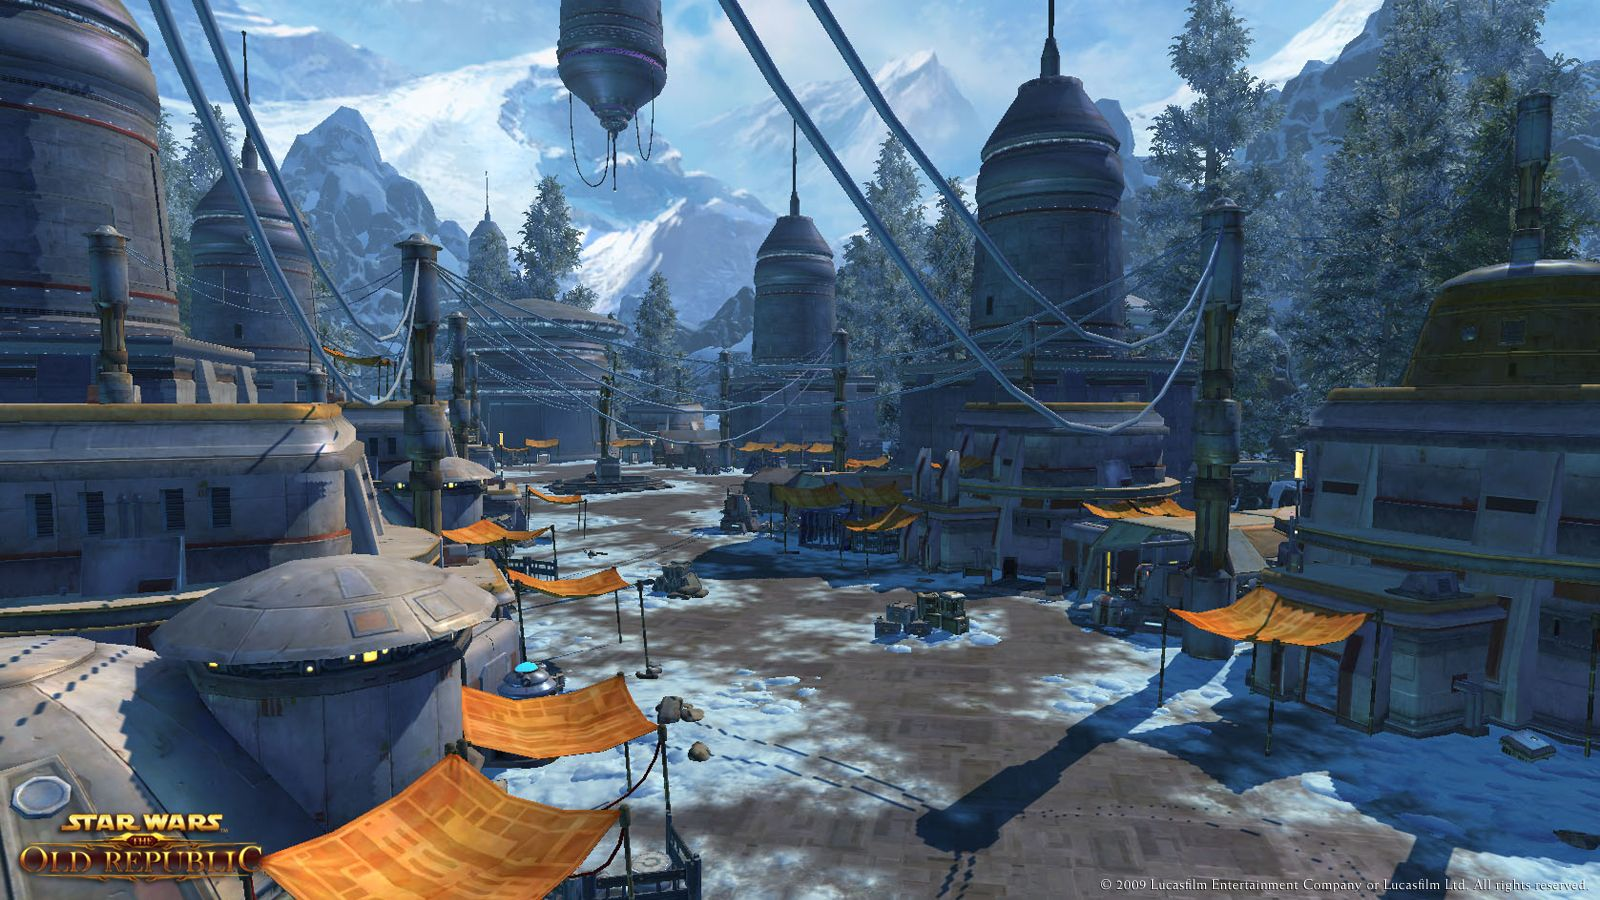 Star Wars The Old Republic Alderaan Planet Screenshots Gaming Phanatic